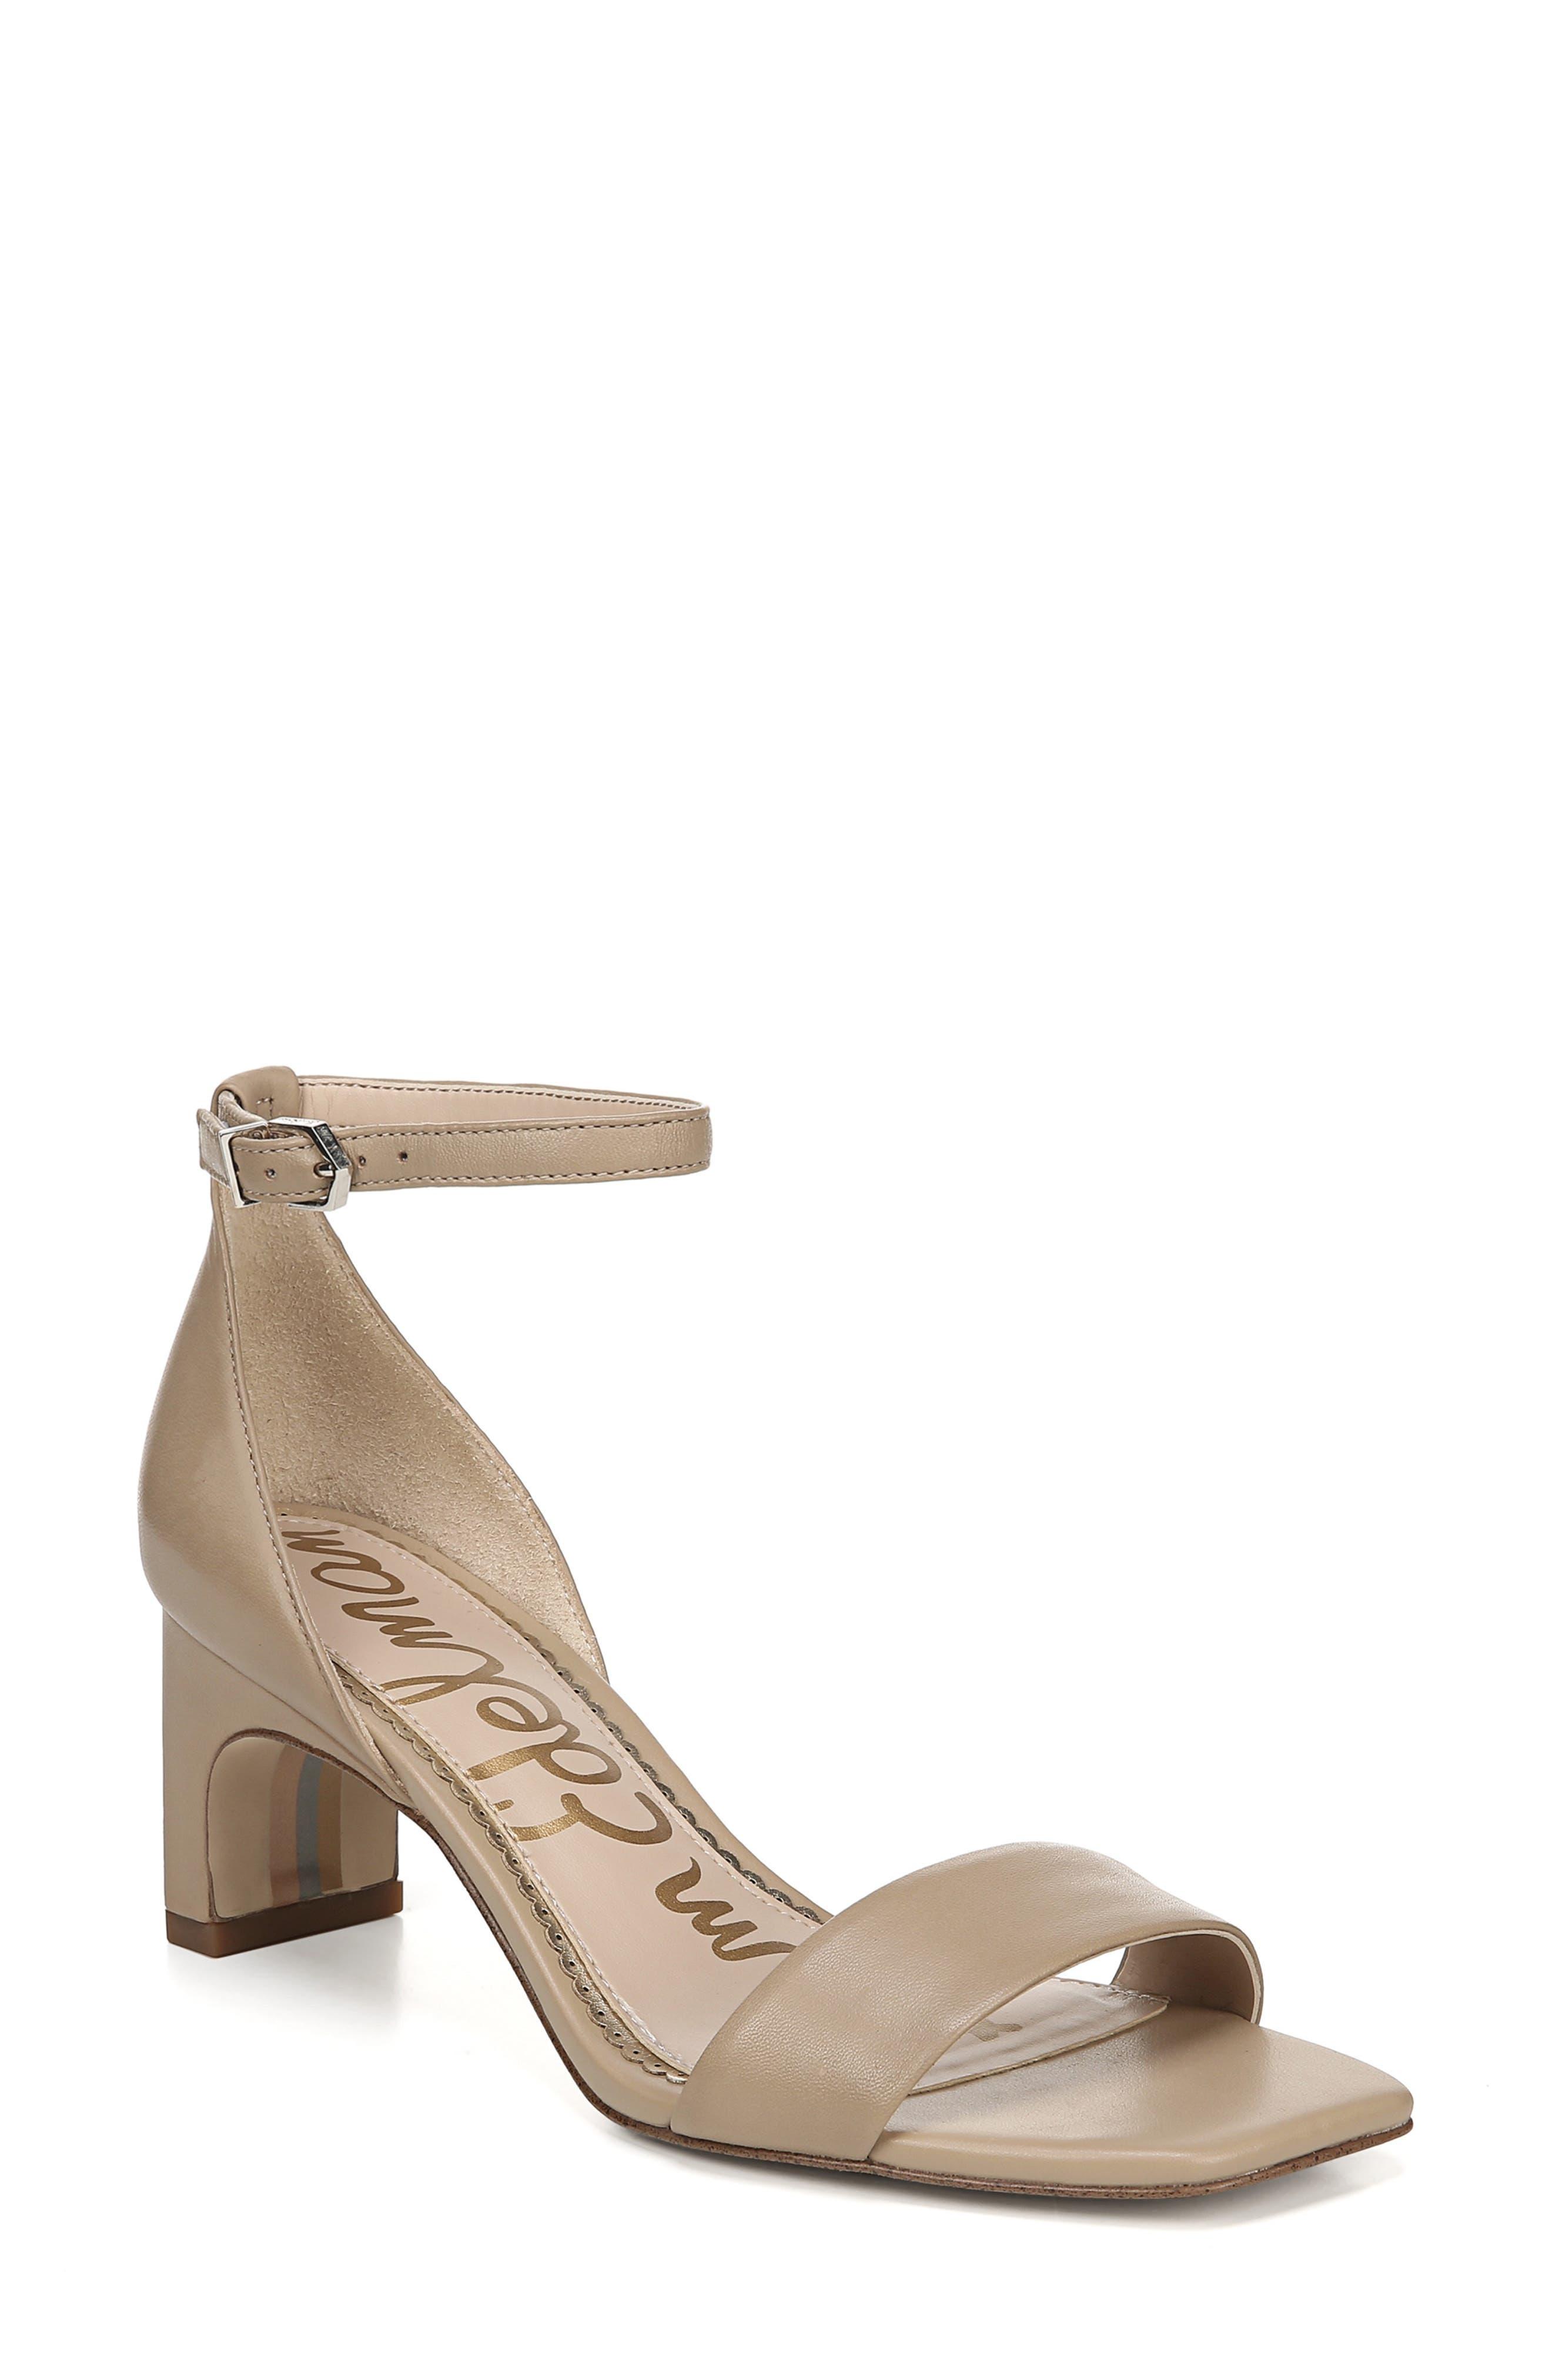 Sam Edelman Holmes Ankle Strap Sandal- Beige